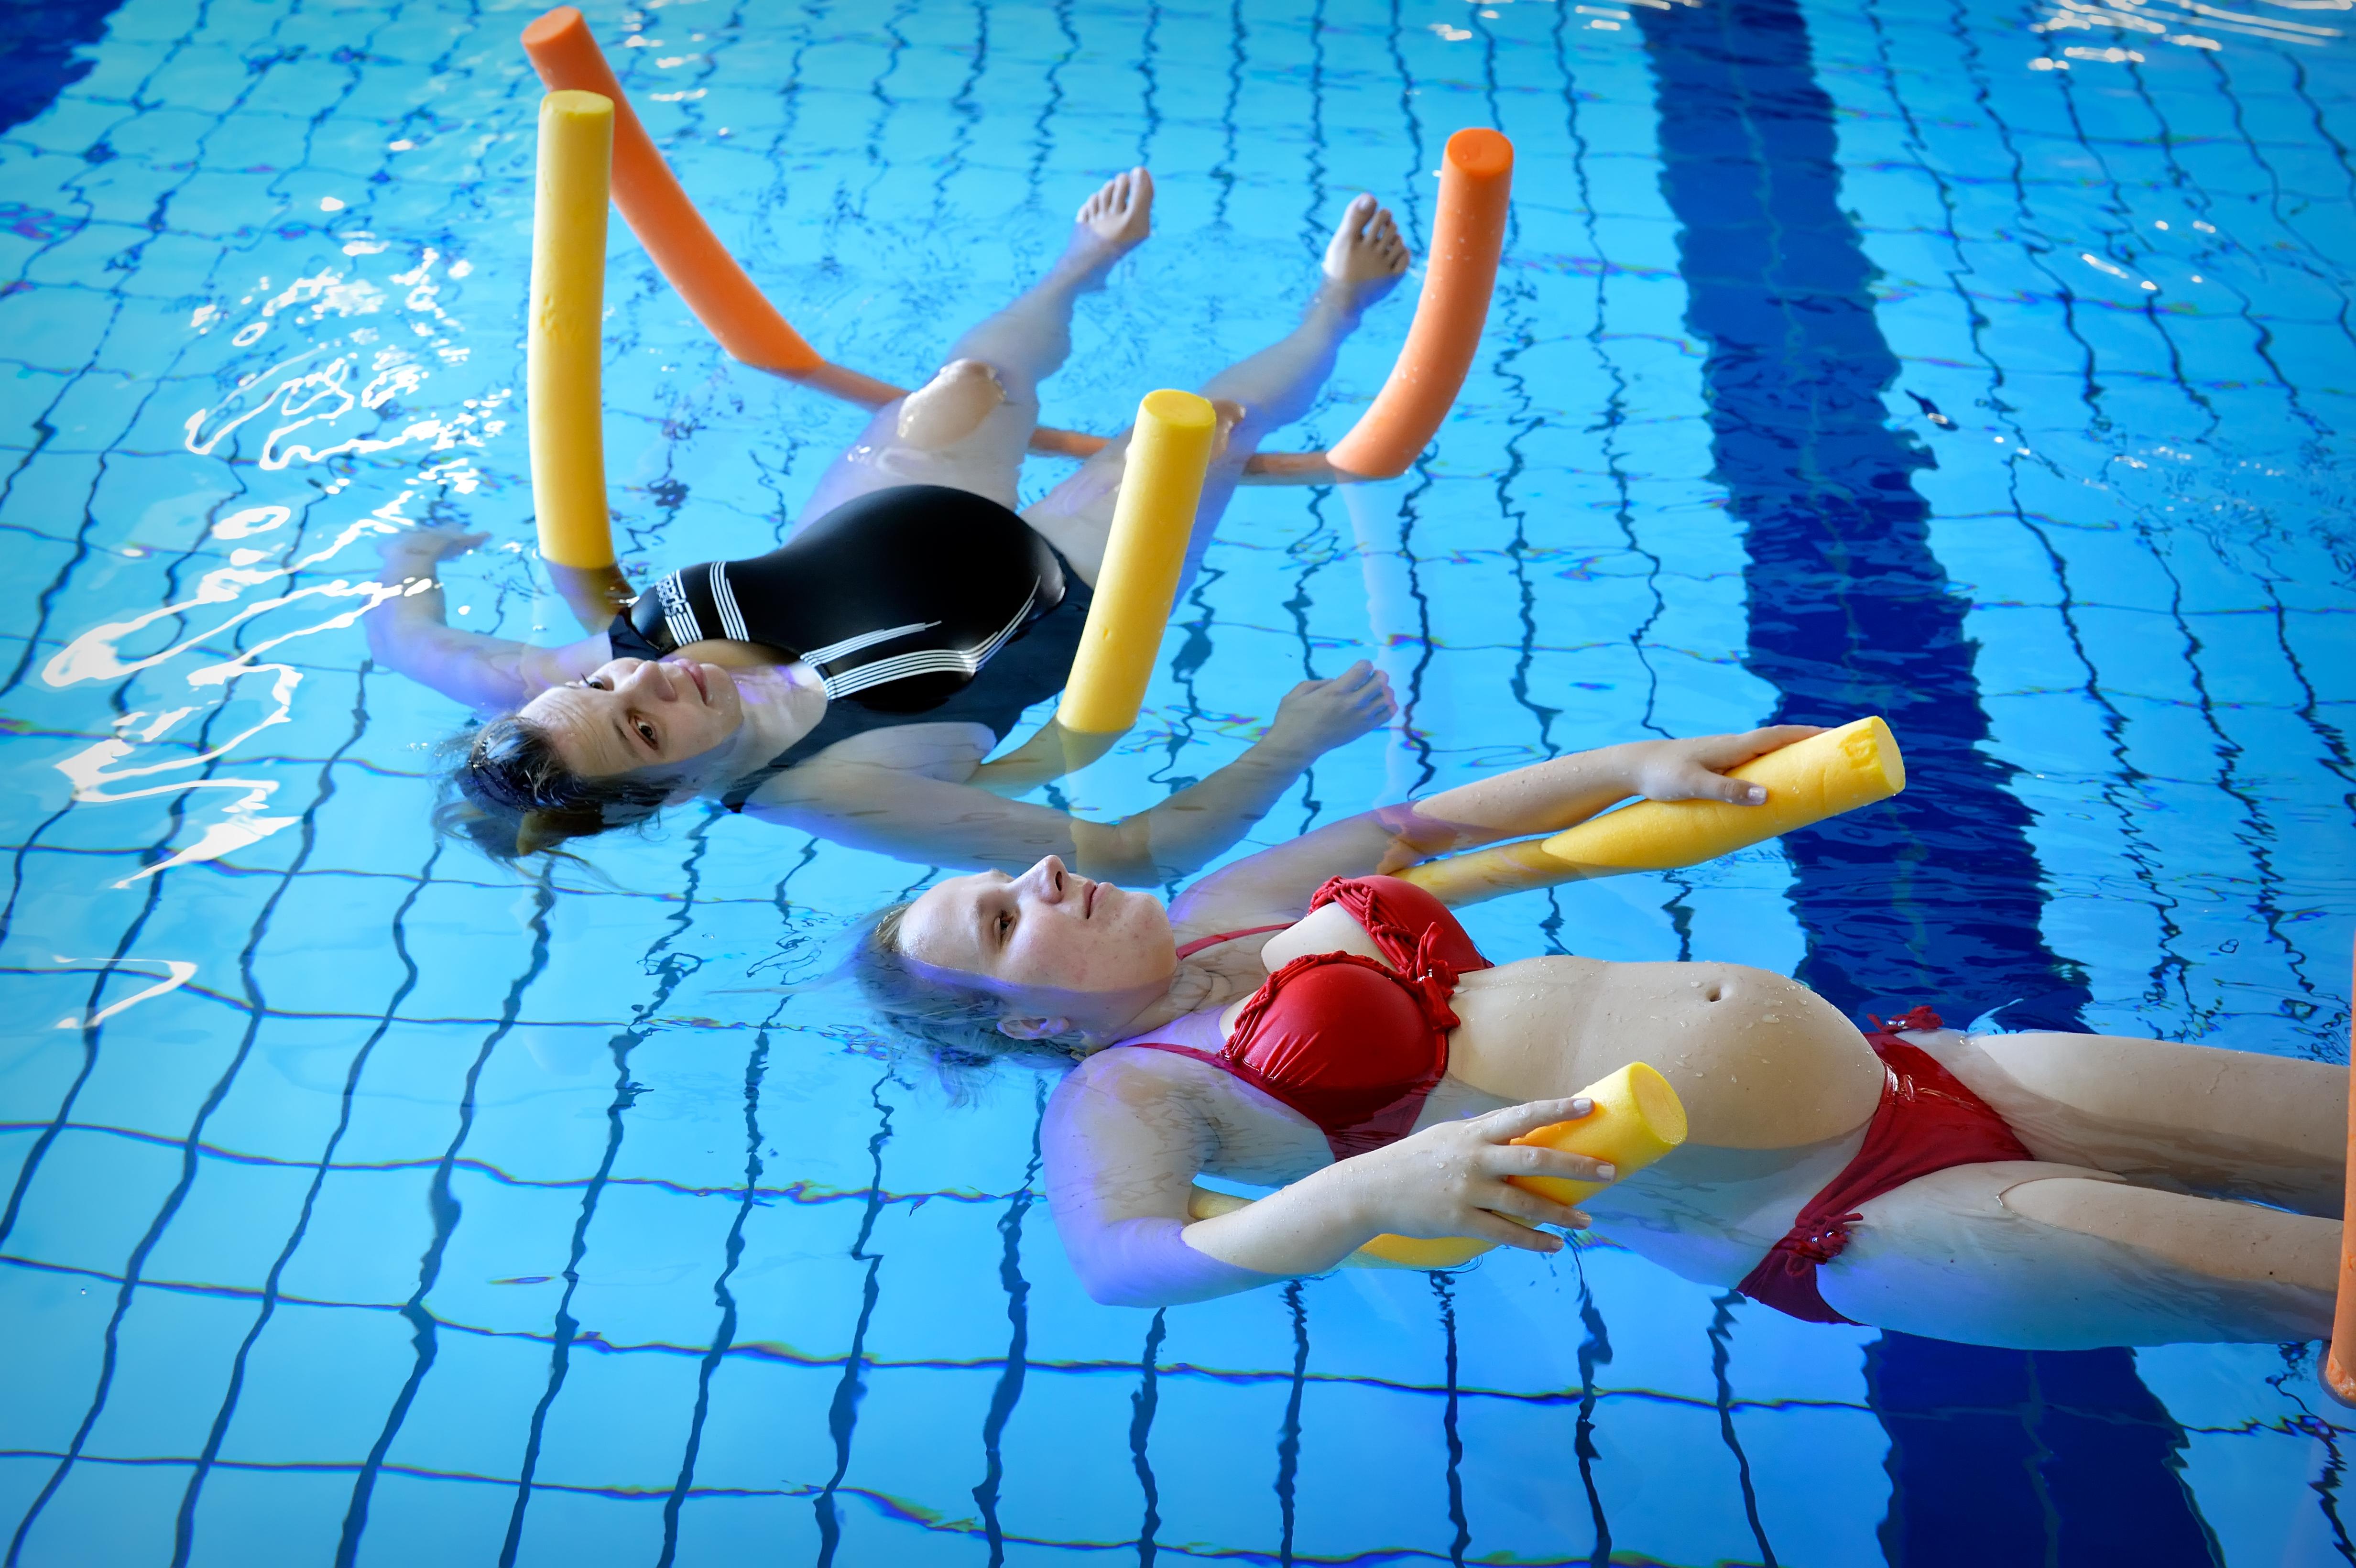 Zwangerschapszwemmen. (Foto: aangeleverd)